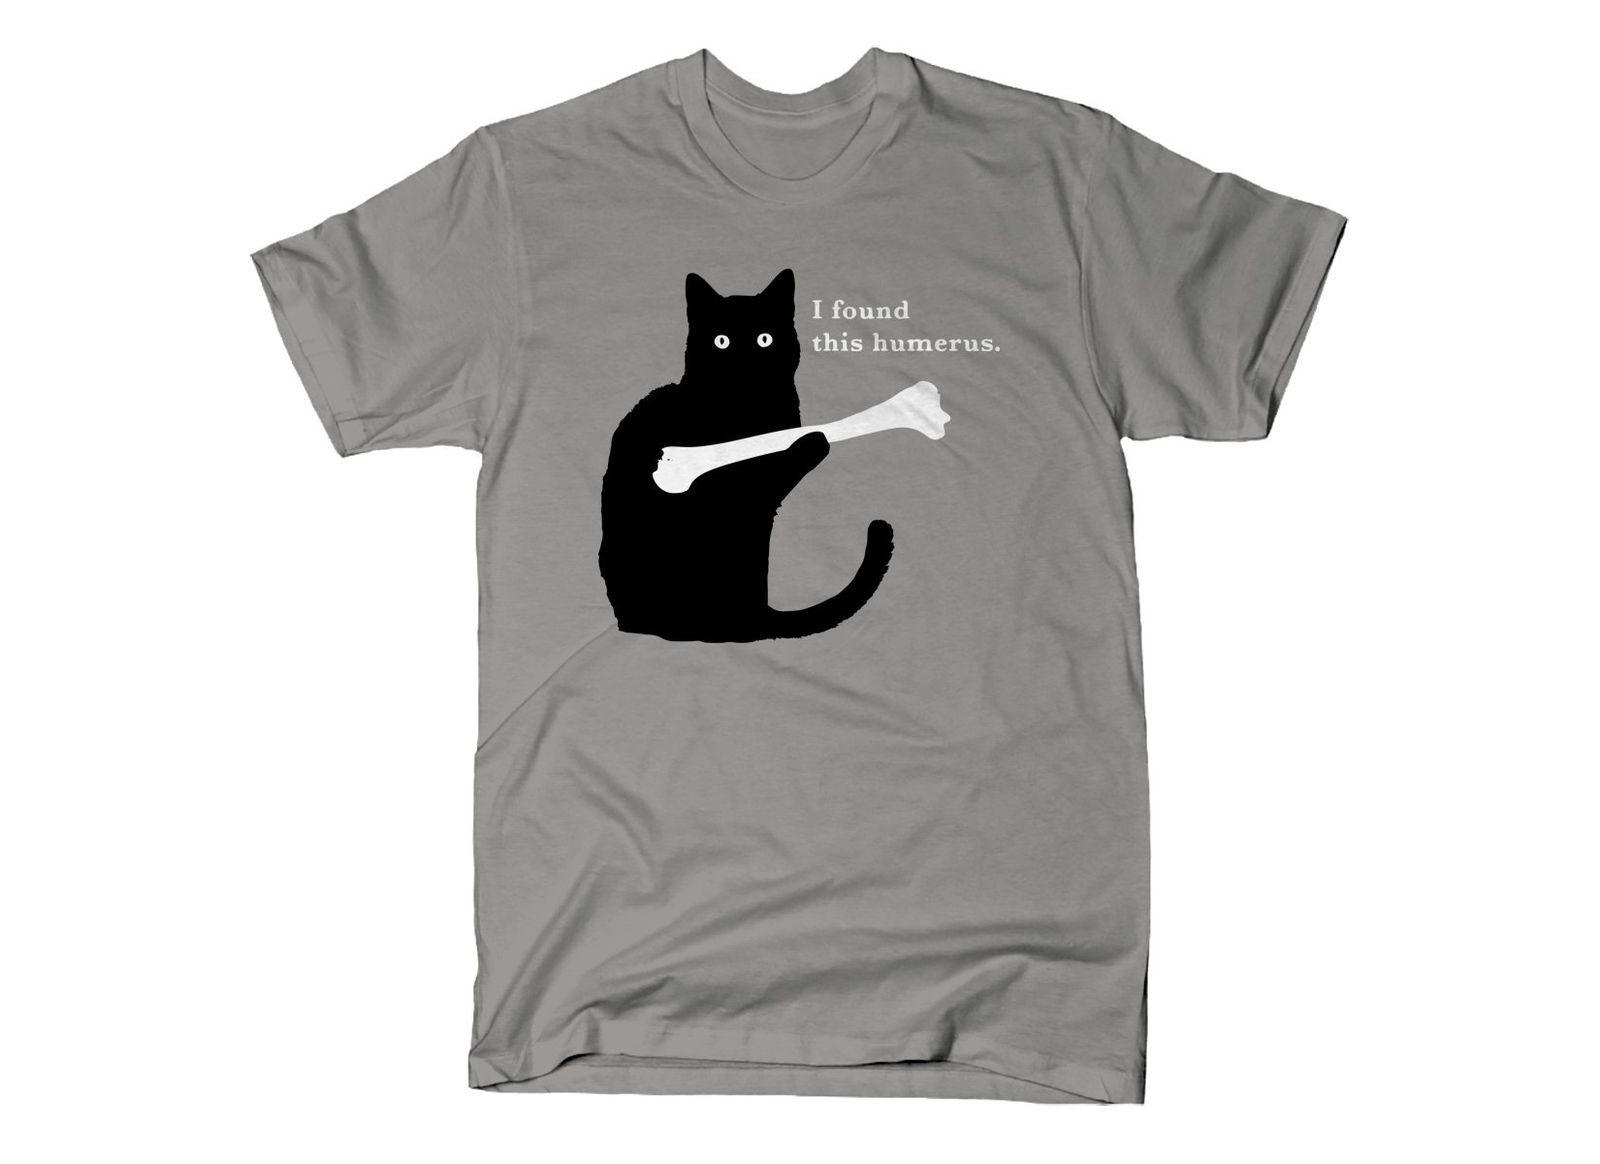 5978d5883 Cat I Found This Humerus T Shirt Dark Heather Cotton Men T Shirt Size  Cartoon T Shirt Men Unisex New Fashion Tshirt Funny T Shirts Online Hilarious  T Shirts ...